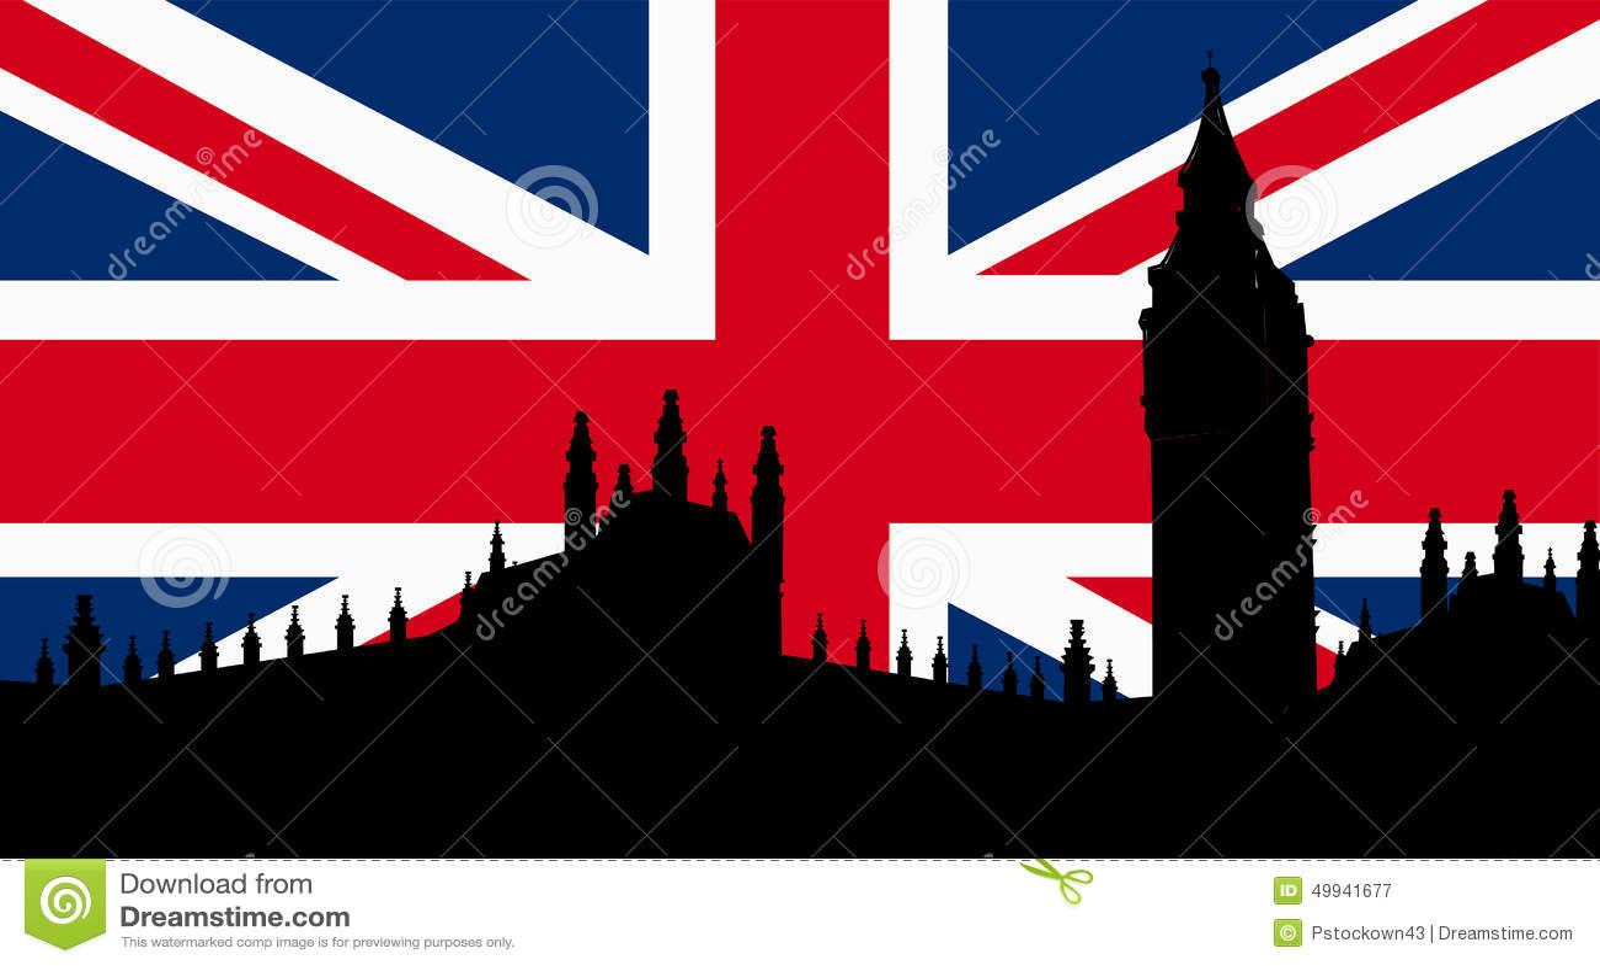 Old Fashioned British Flag